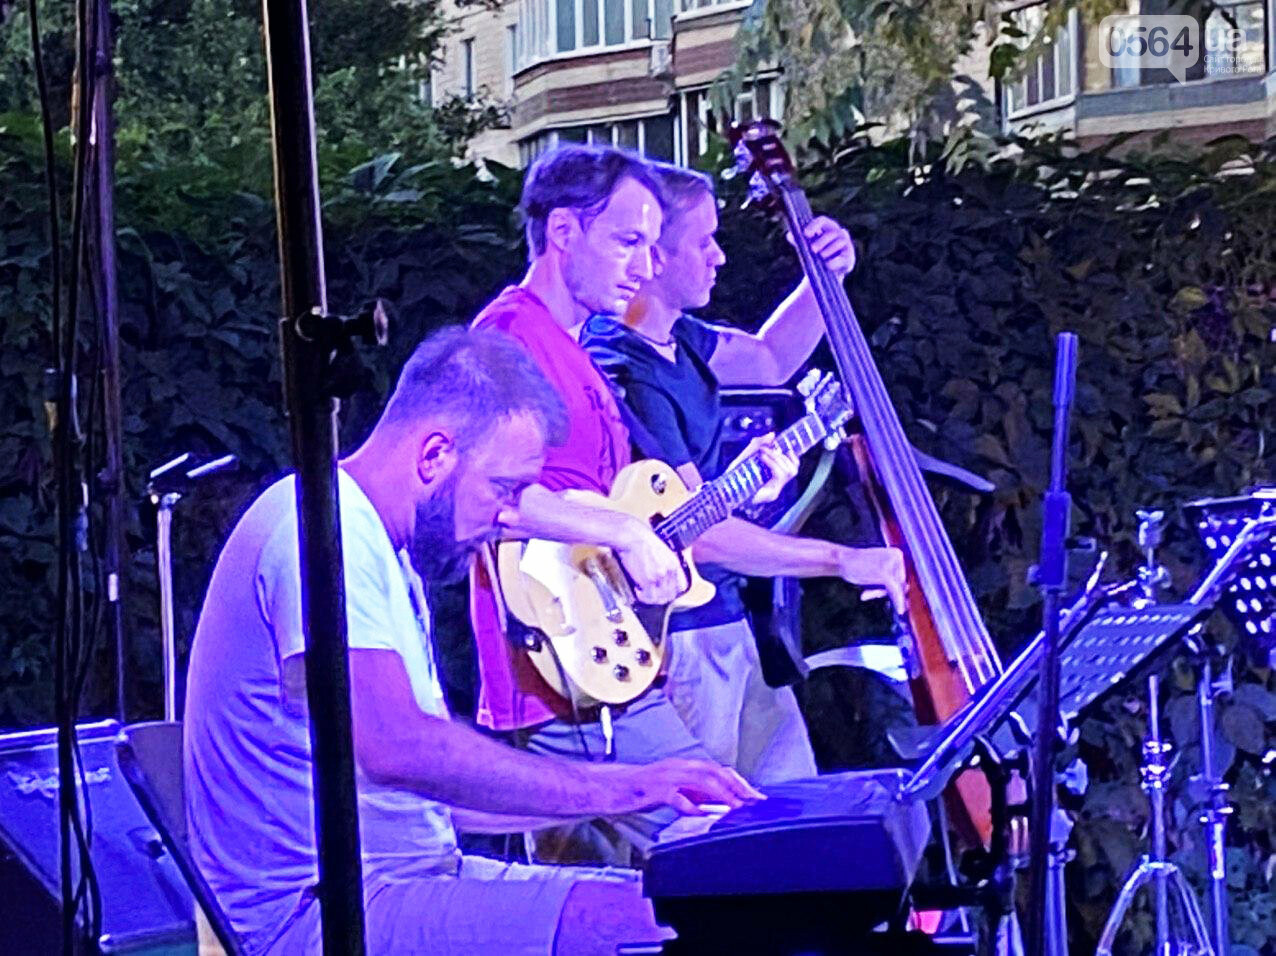 Под звездным небом криворожане наслаждались летним джазом от  Advantage Project, - ФОТО, ВИДЕО , фото-38